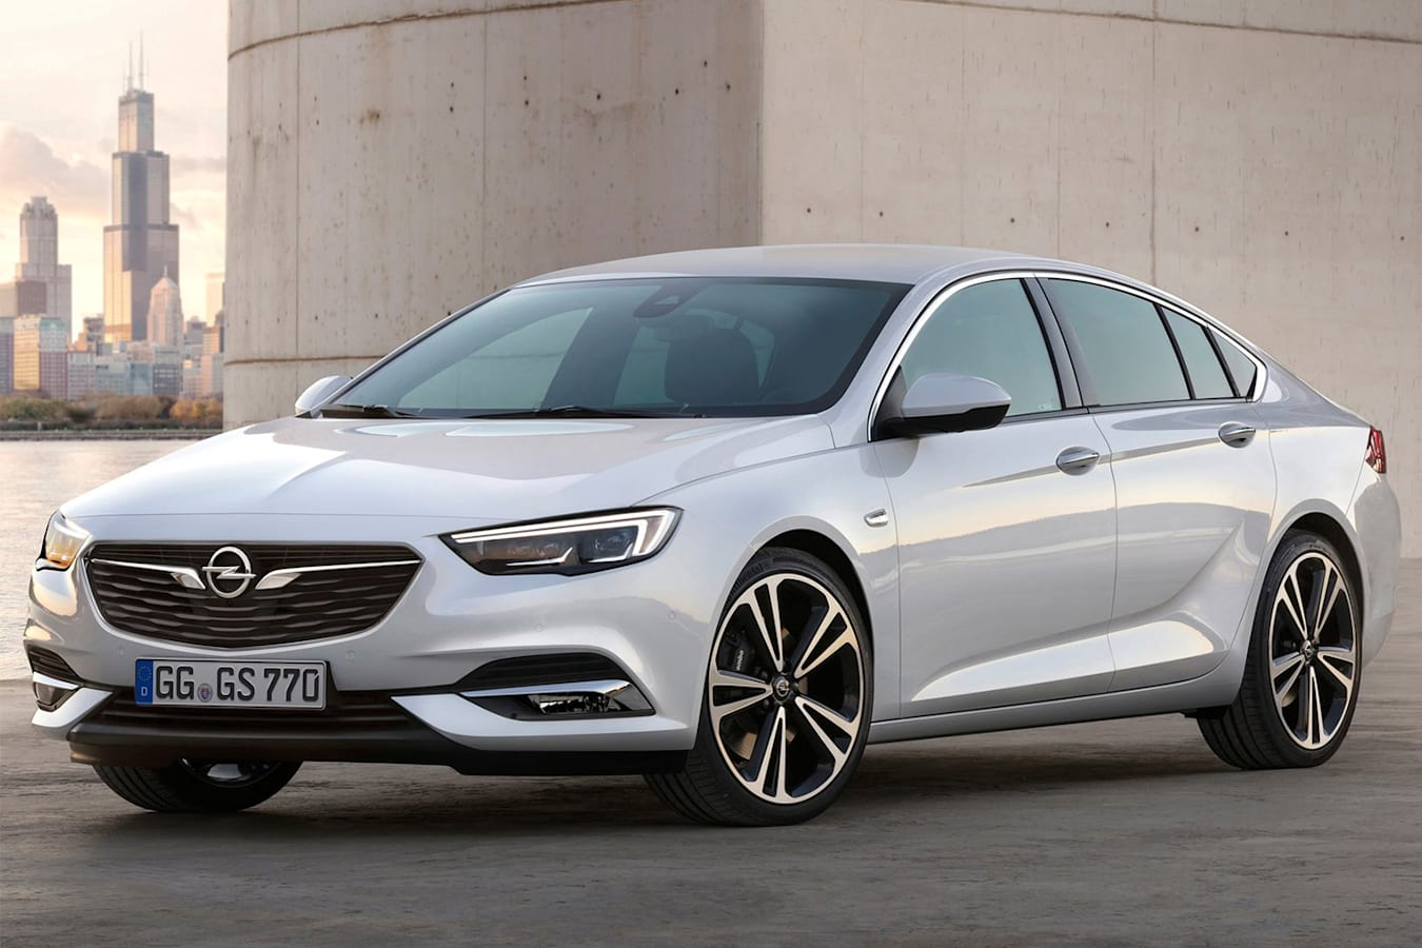 Opel Insignia Grand Sport 2017 Front Side Jpg